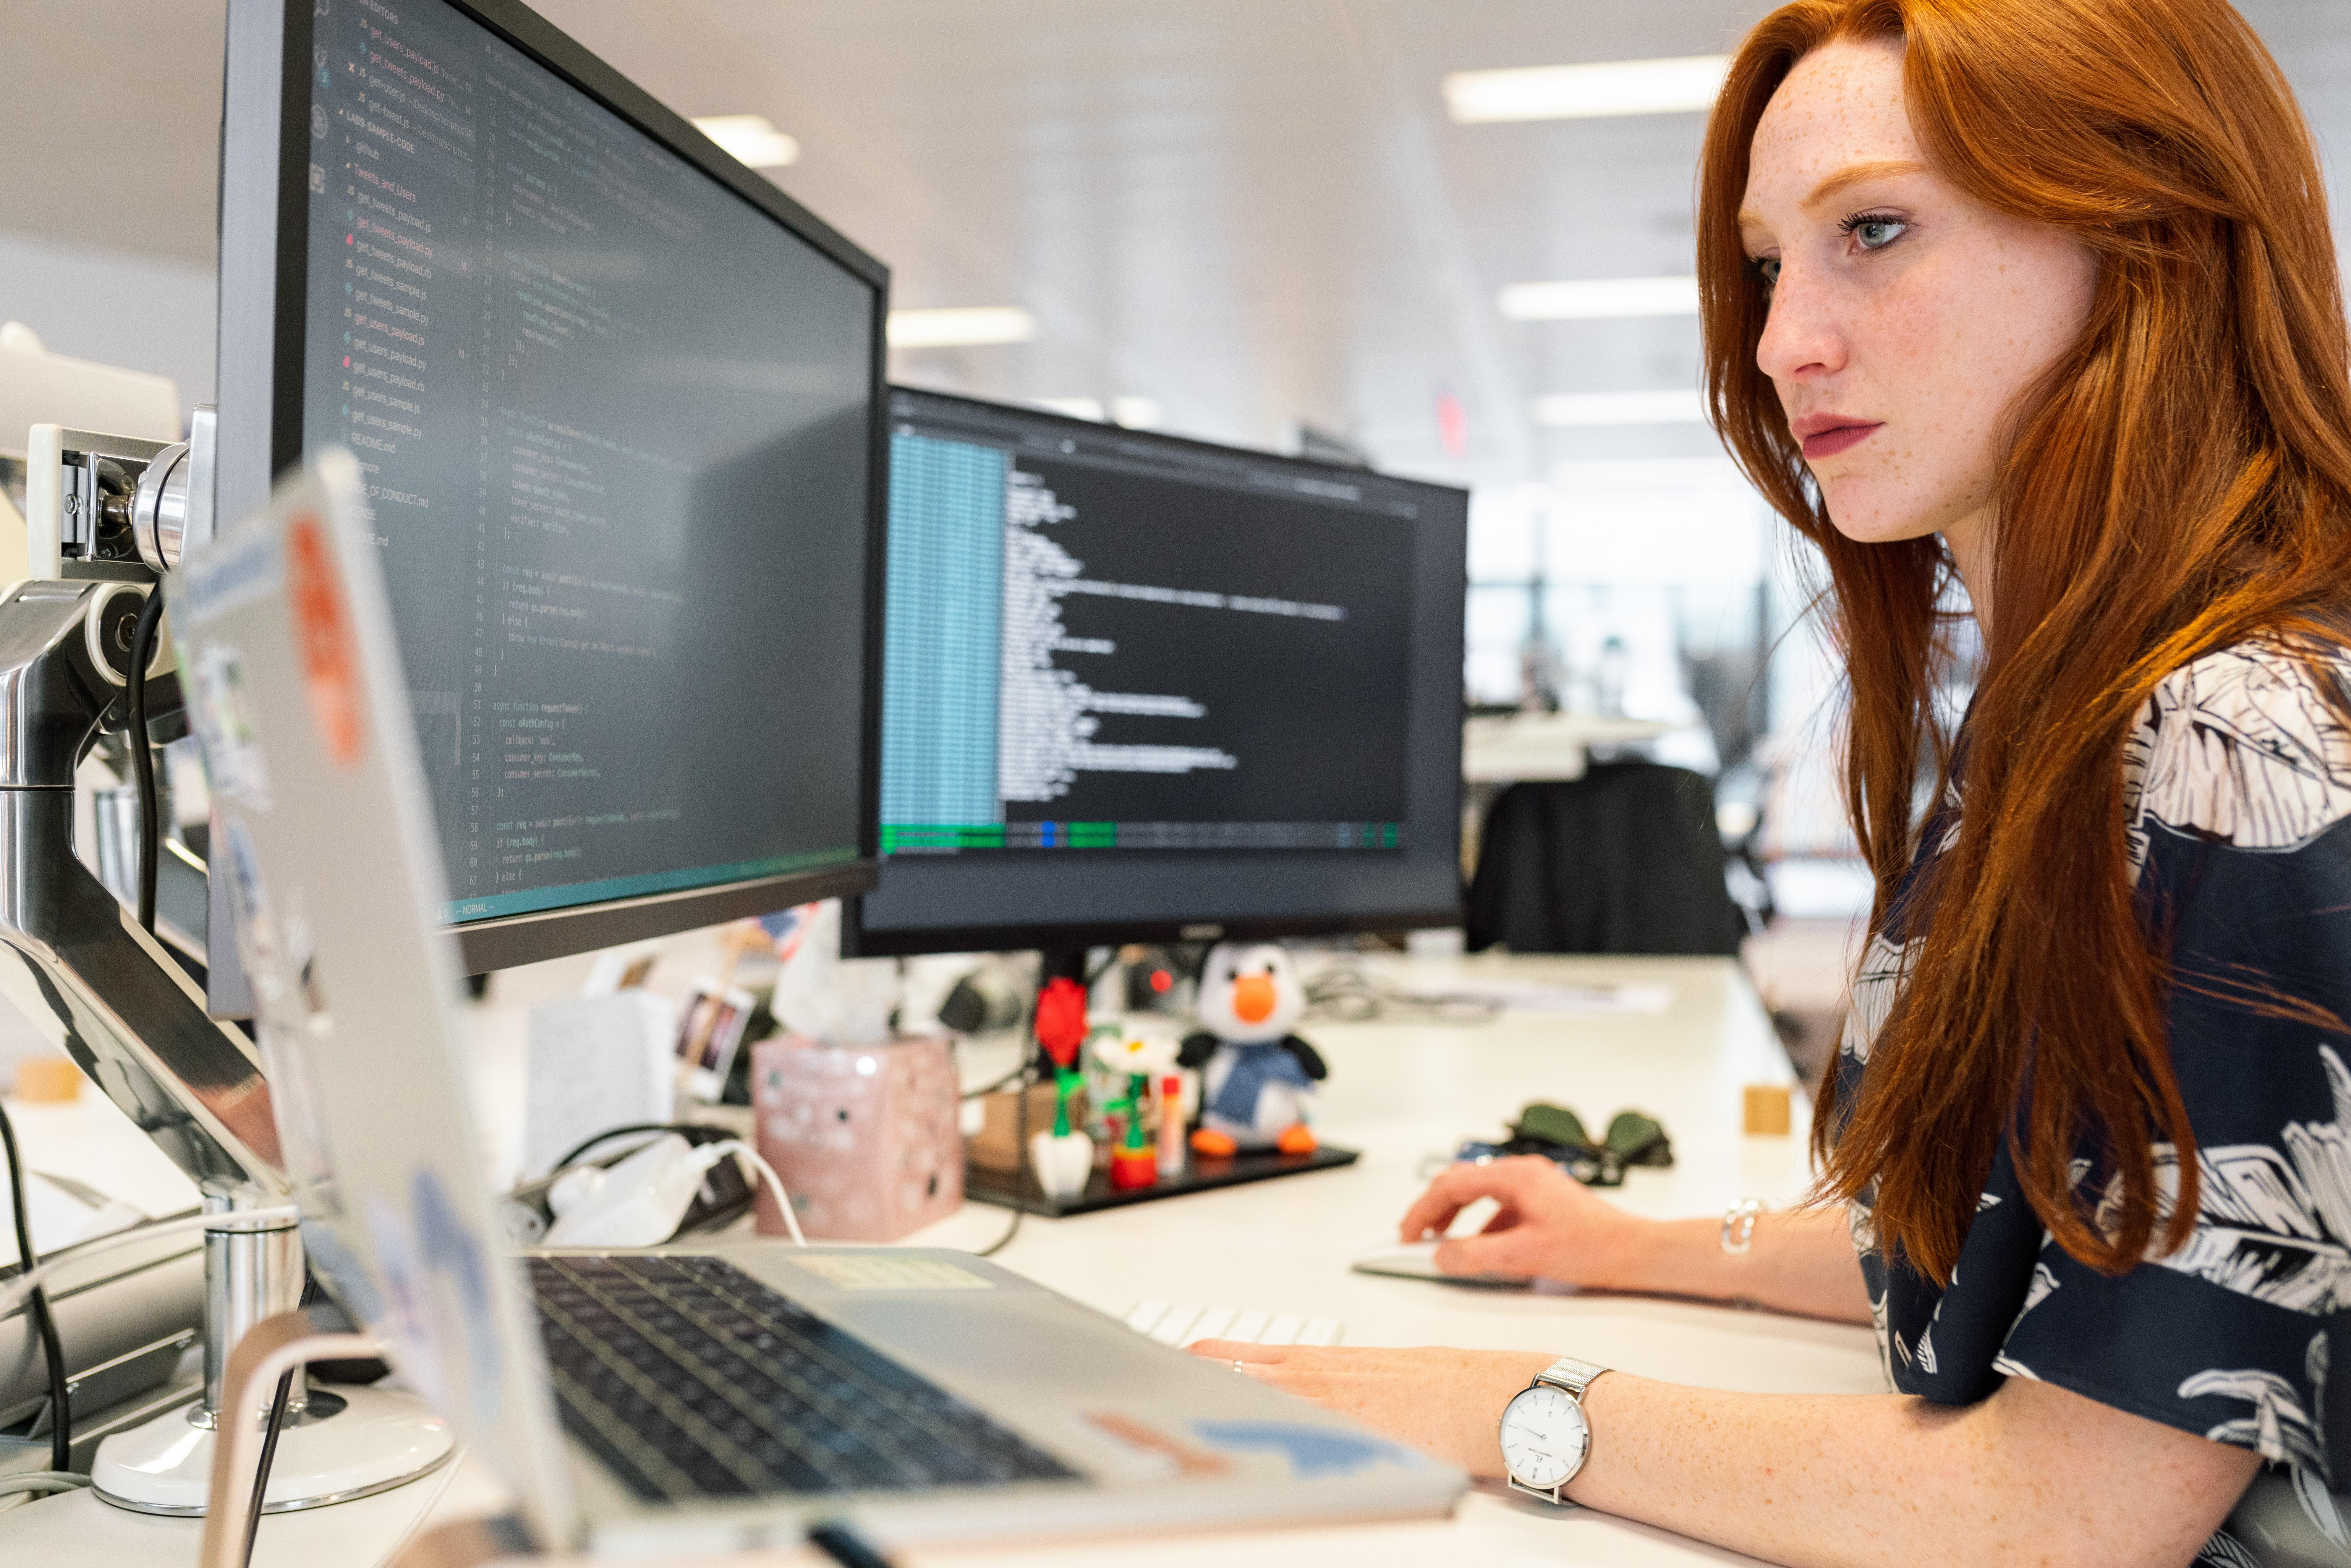 Female Indie Game Developer